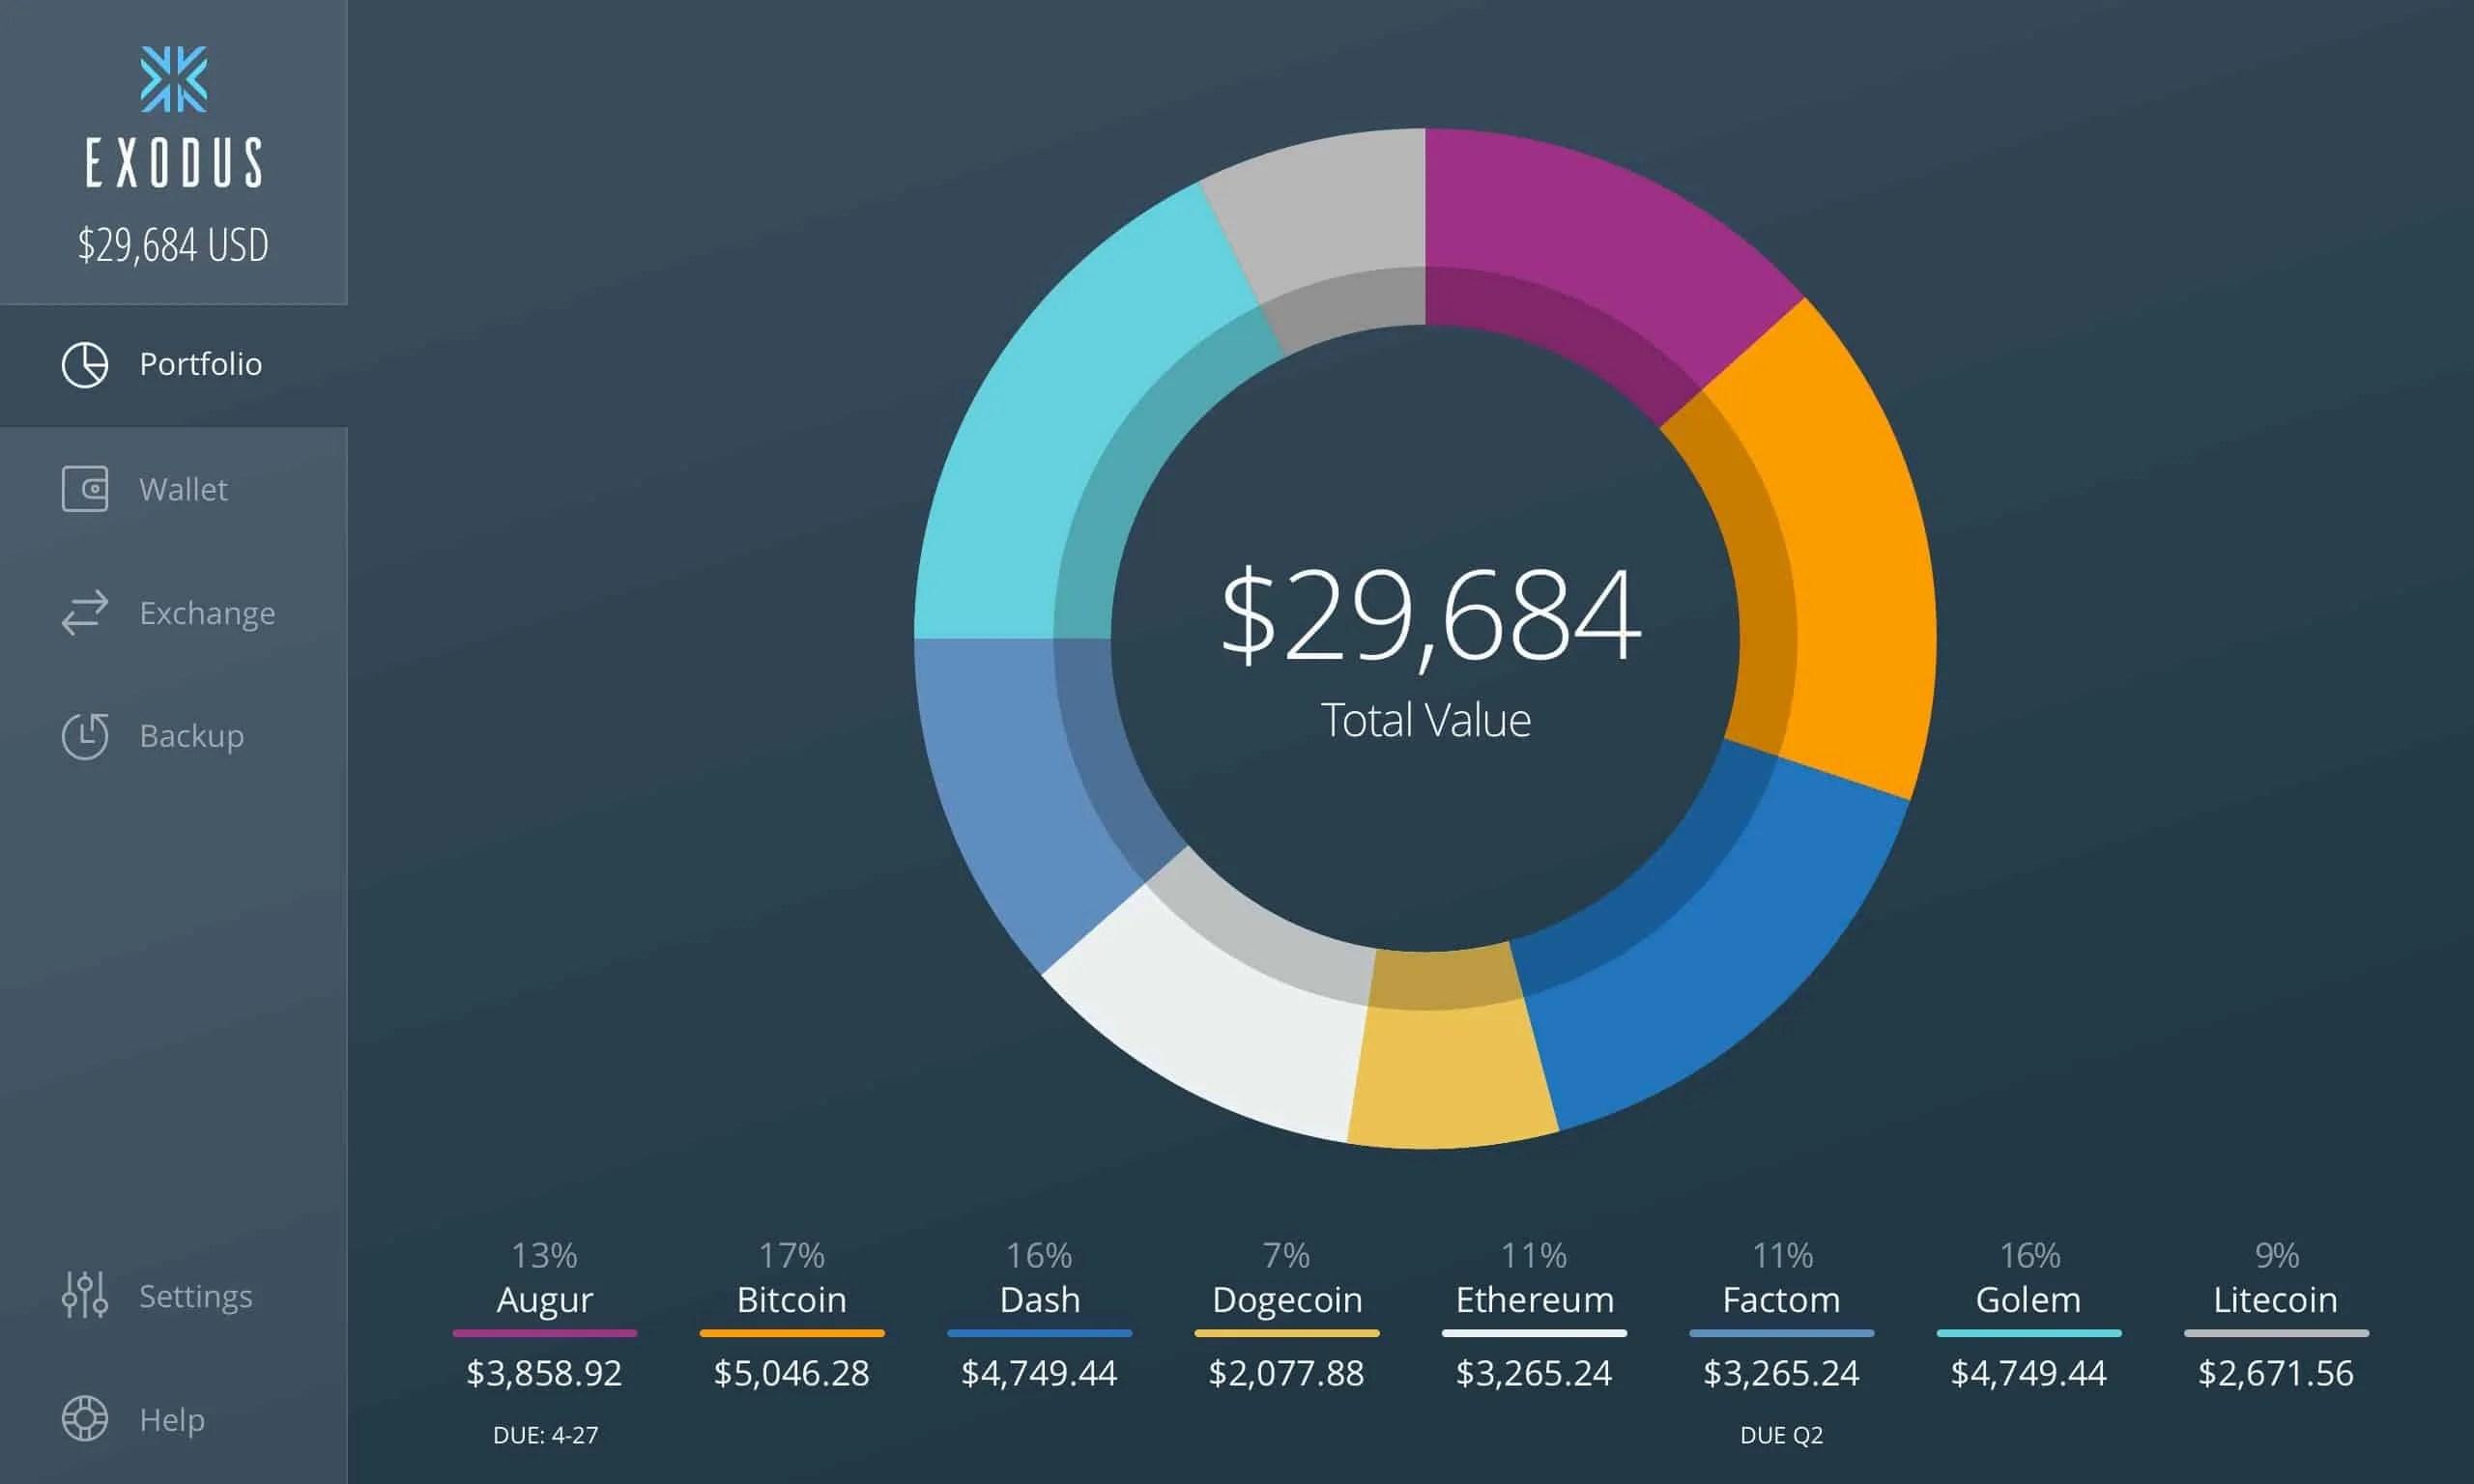 Exodus Wallet per desktop Multi-Asset 8 exodus portafolio wallet